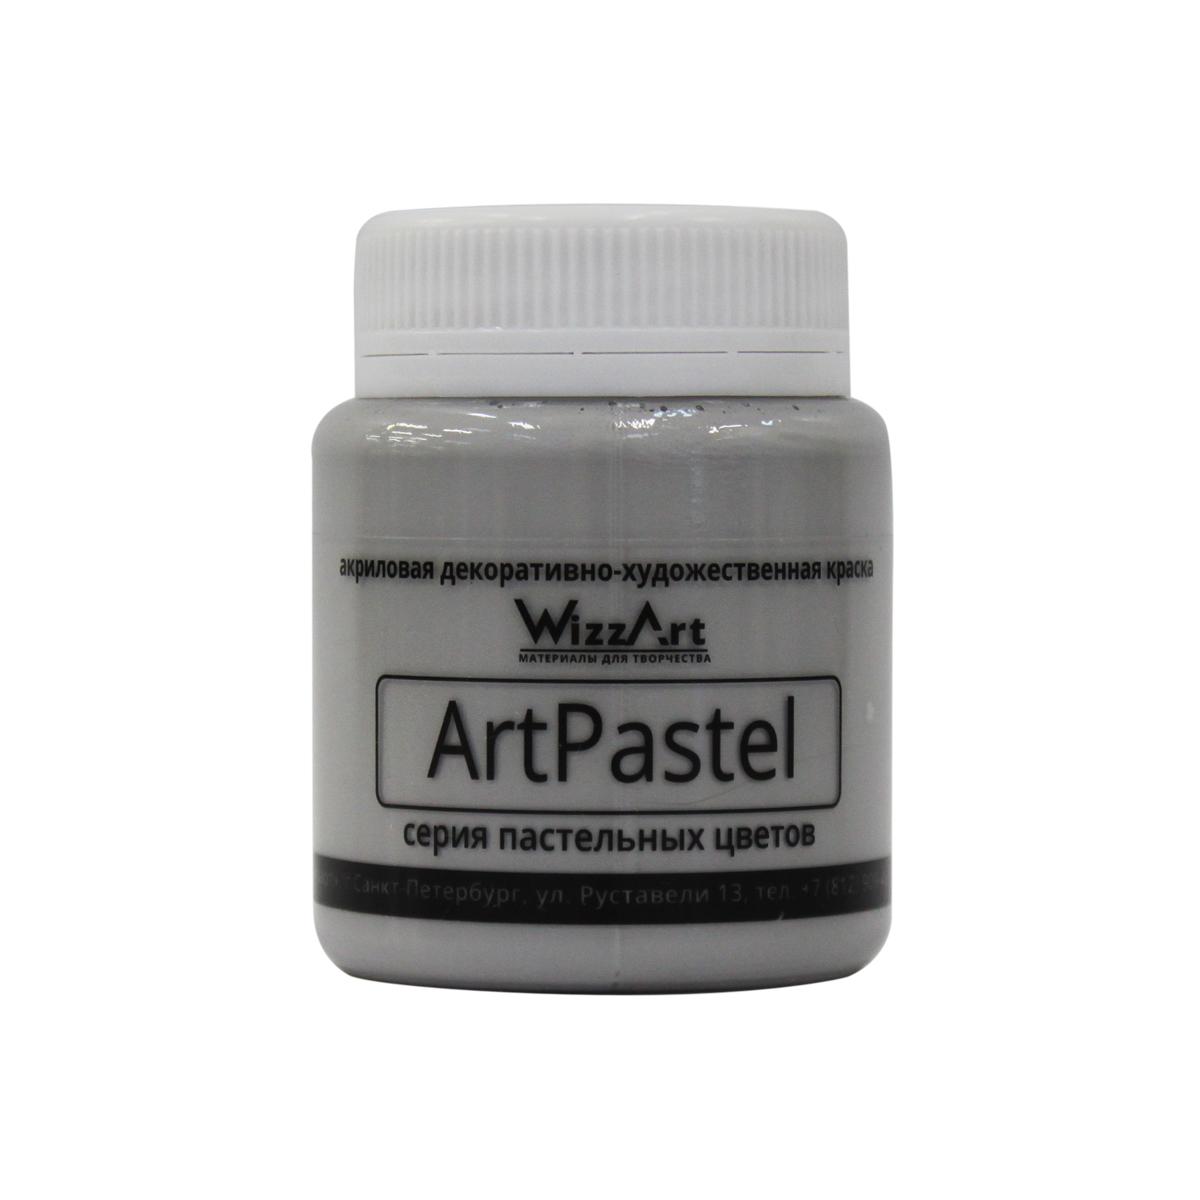 Краска акриловая Wizzart ArtPastel, цвет: серый, 80 мл501018